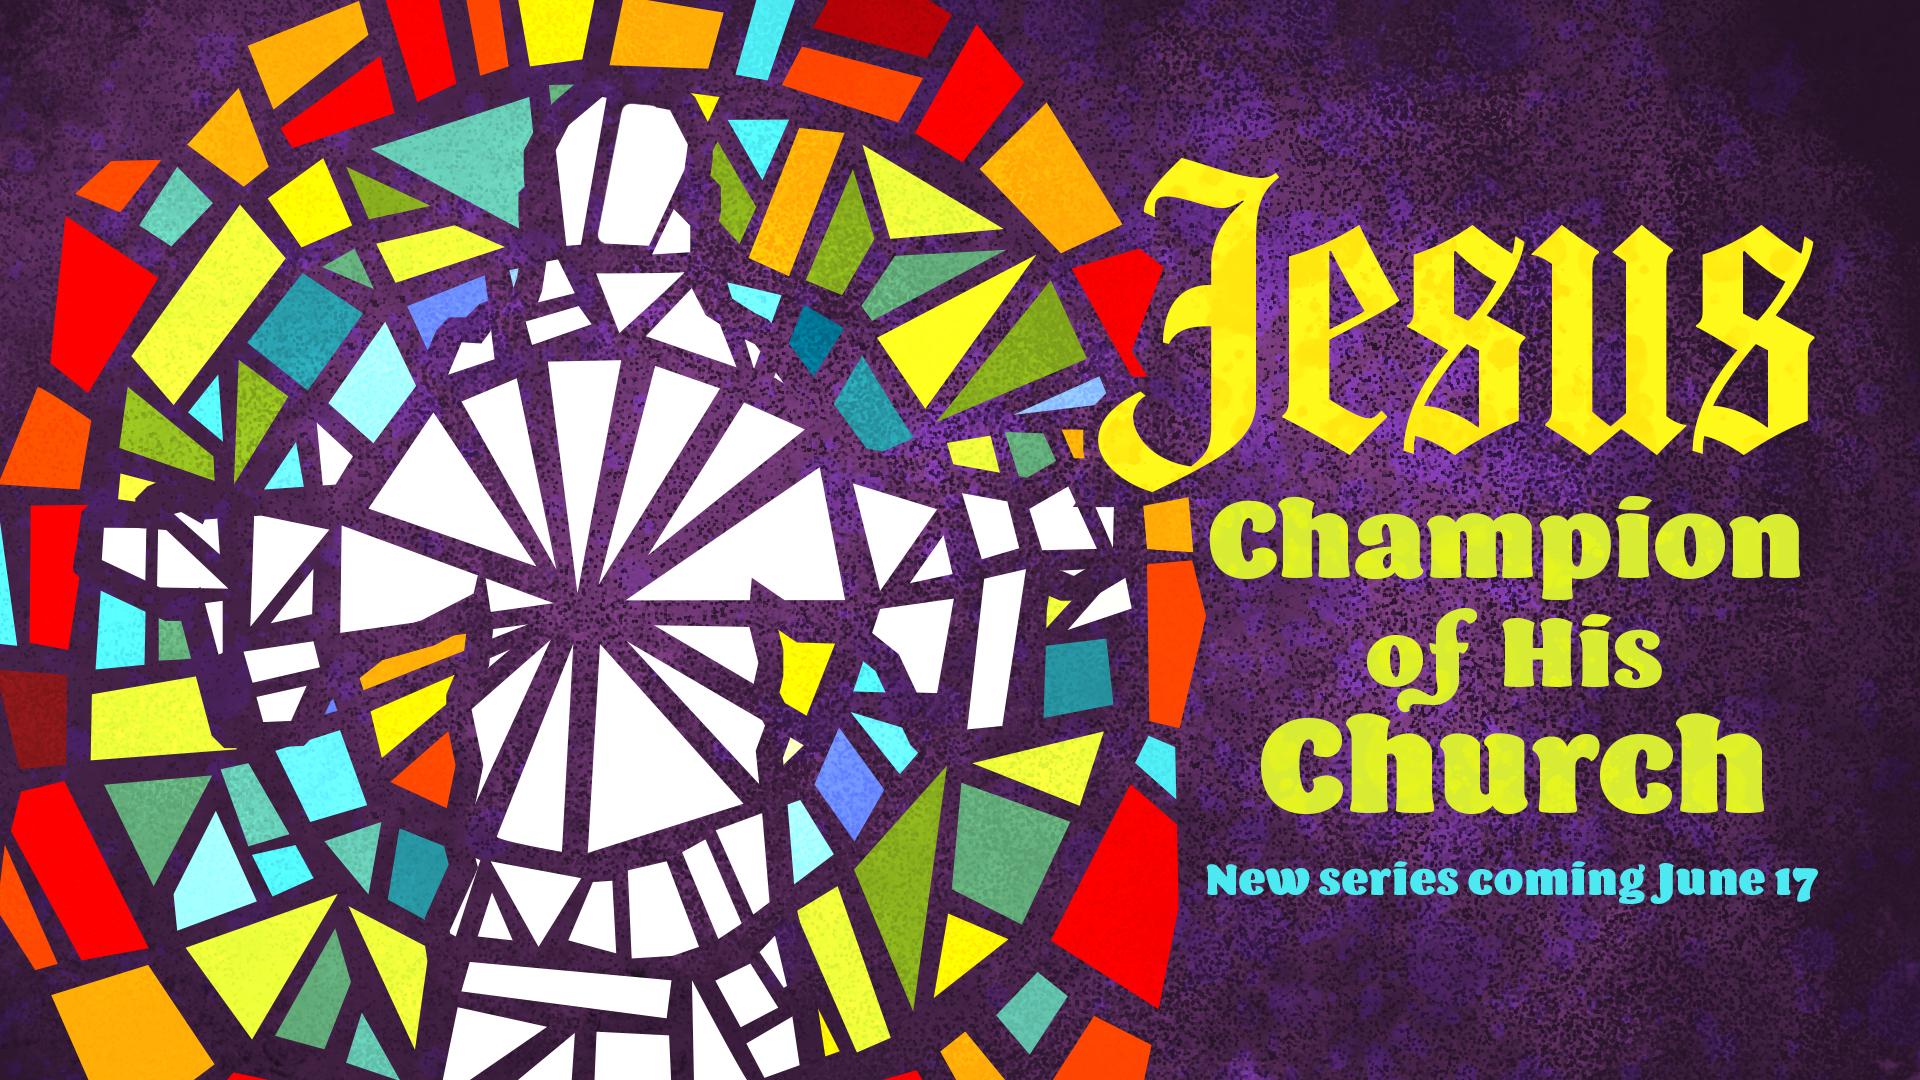 Jesus: Champion of His Church